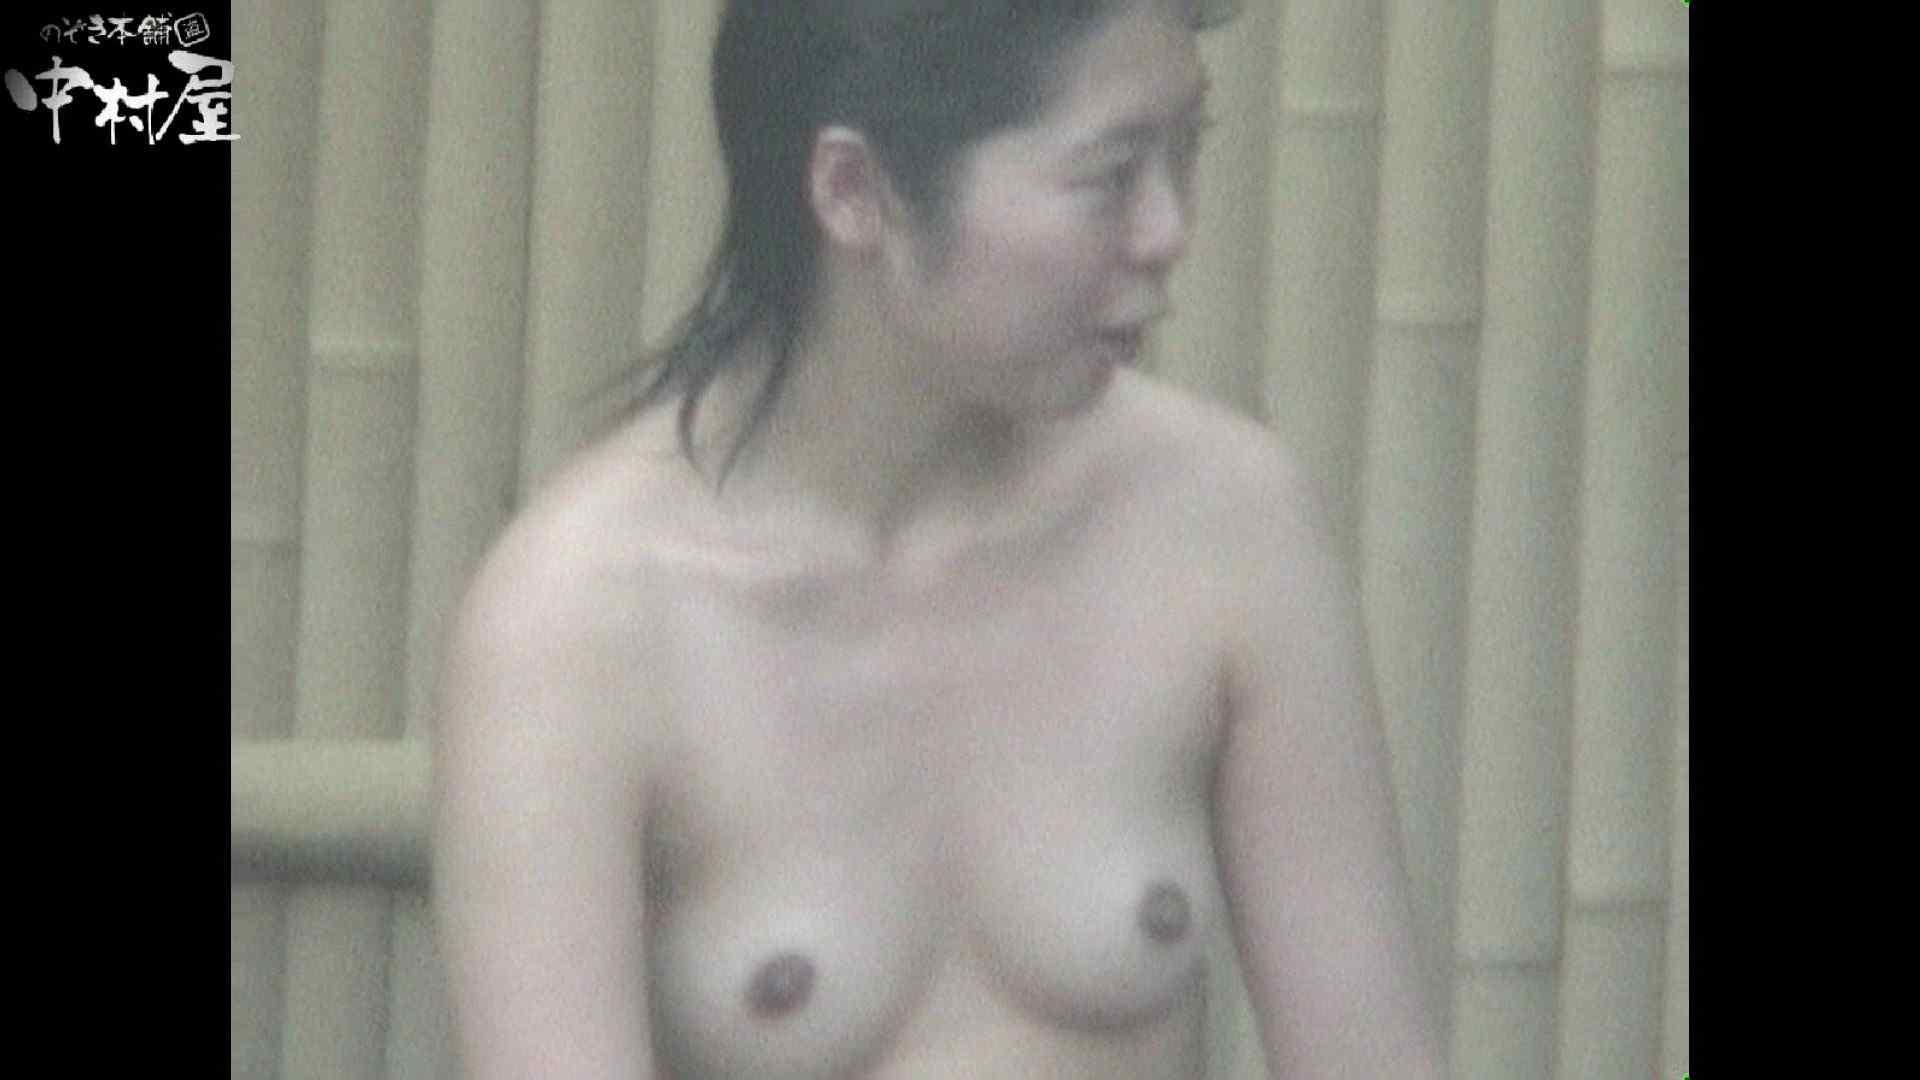 Aquaな露天風呂Vol.932 盗撮師作品  106pic 9